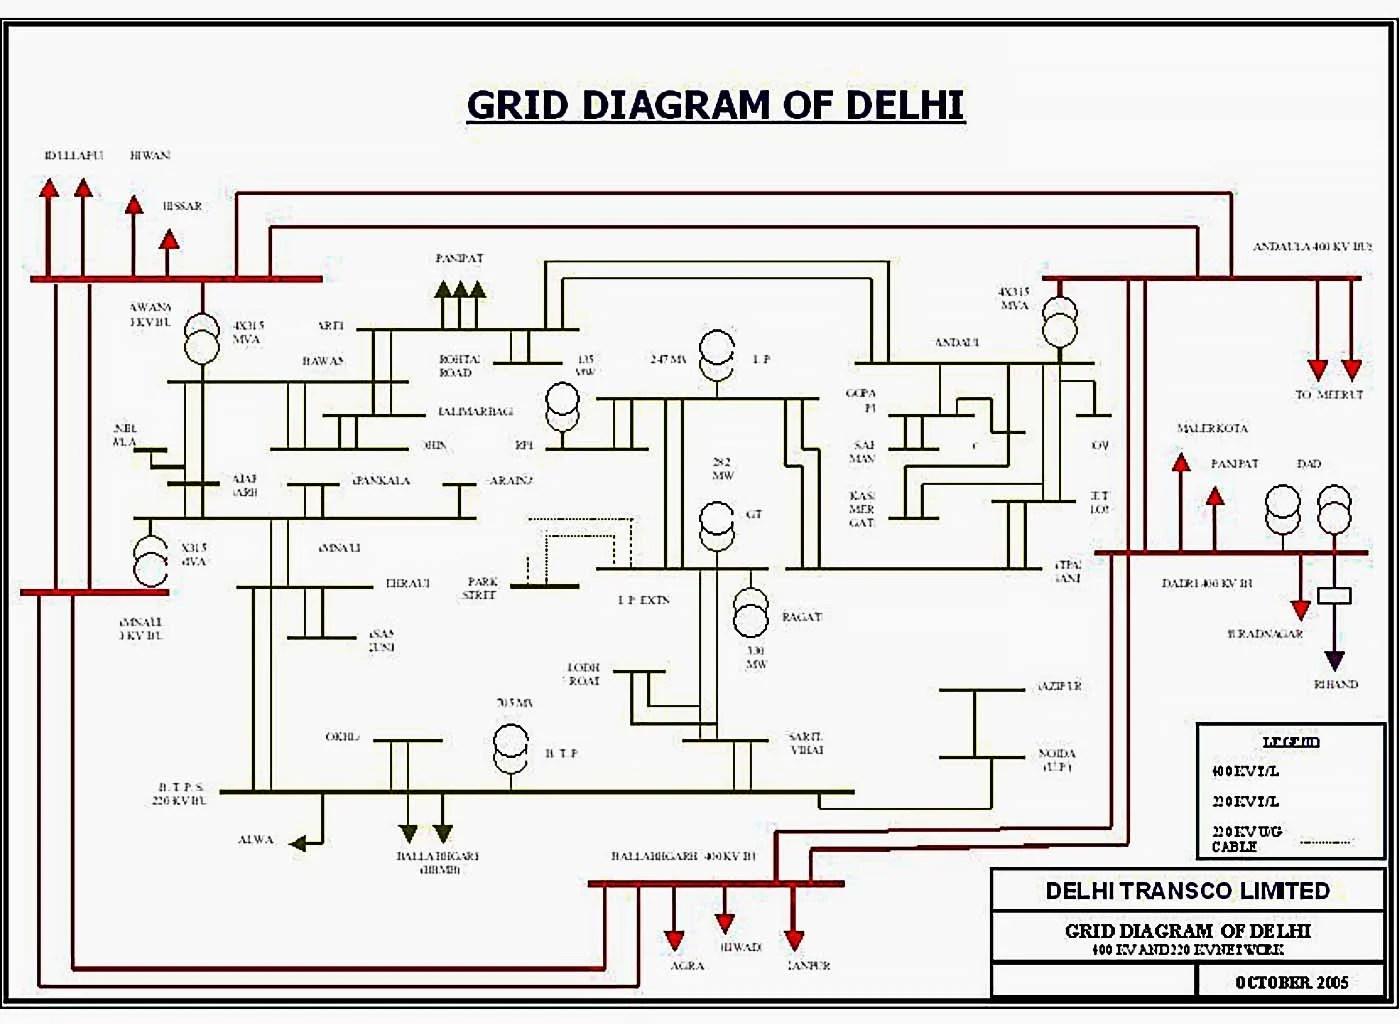 hight resolution of practical training report on 220 66 11 kv substation eep single line diagram key